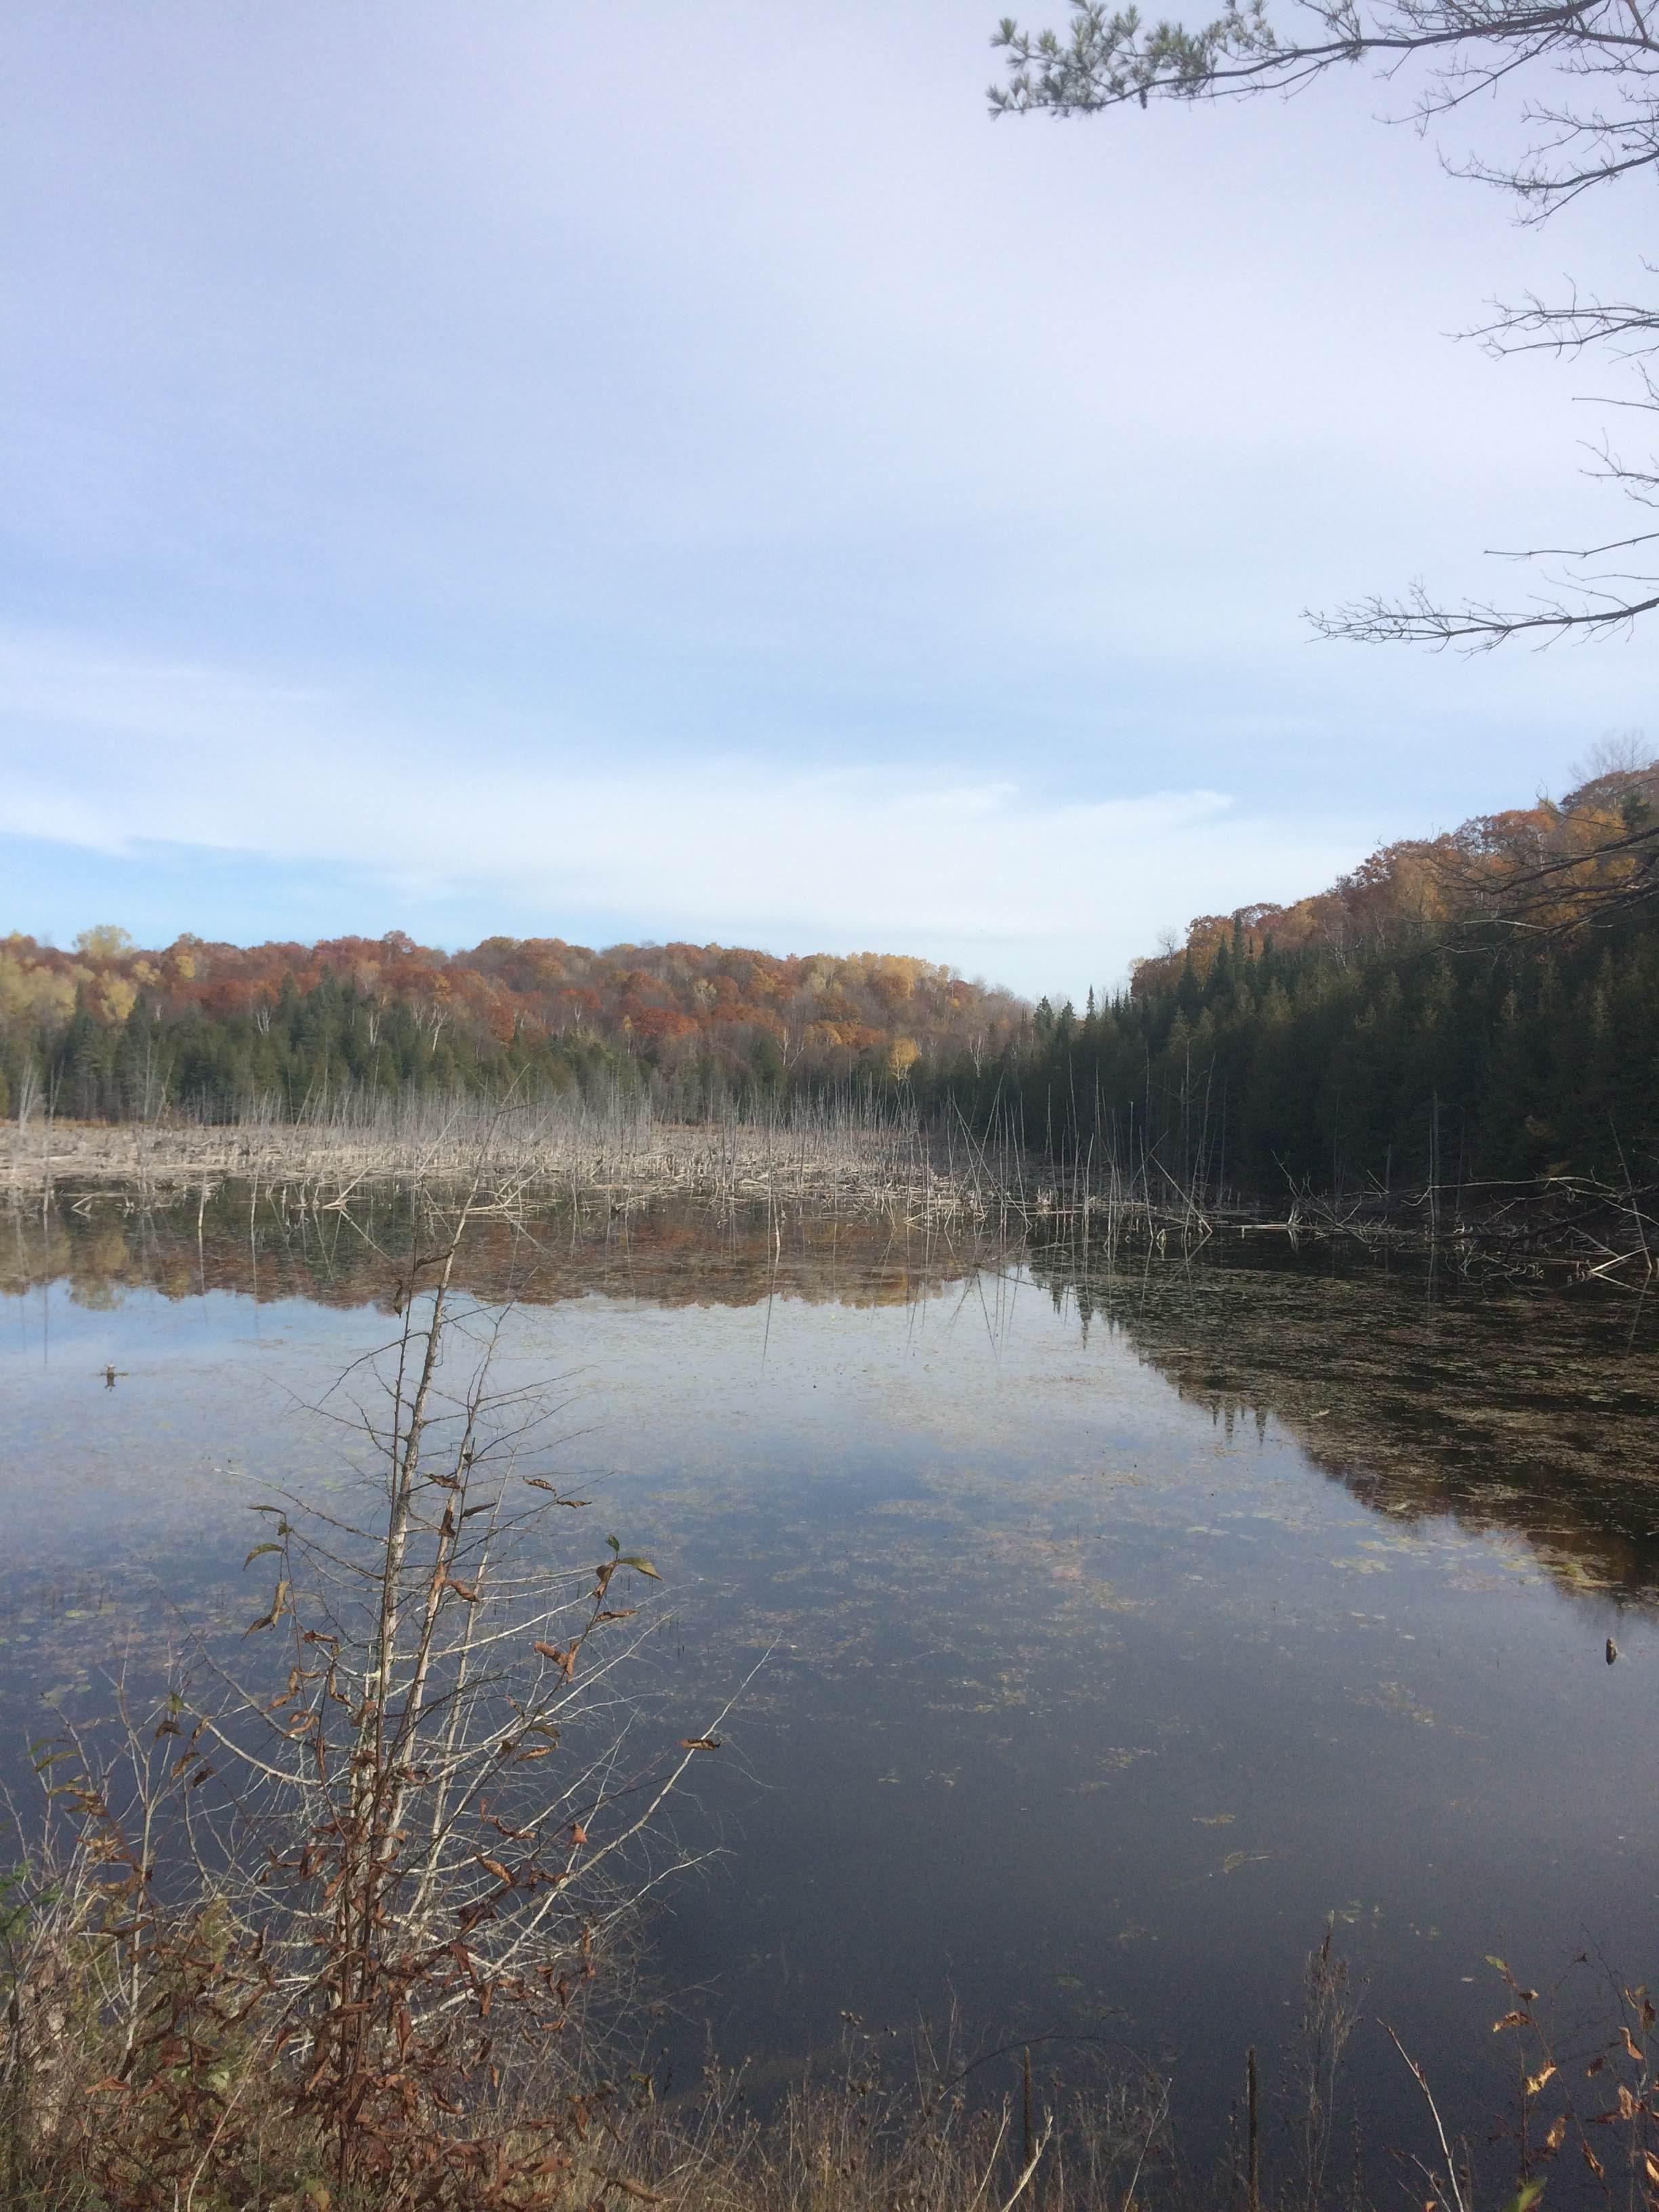 Vacant Land 16659 Hwy 509 Sharbot Lake Ontario Canada